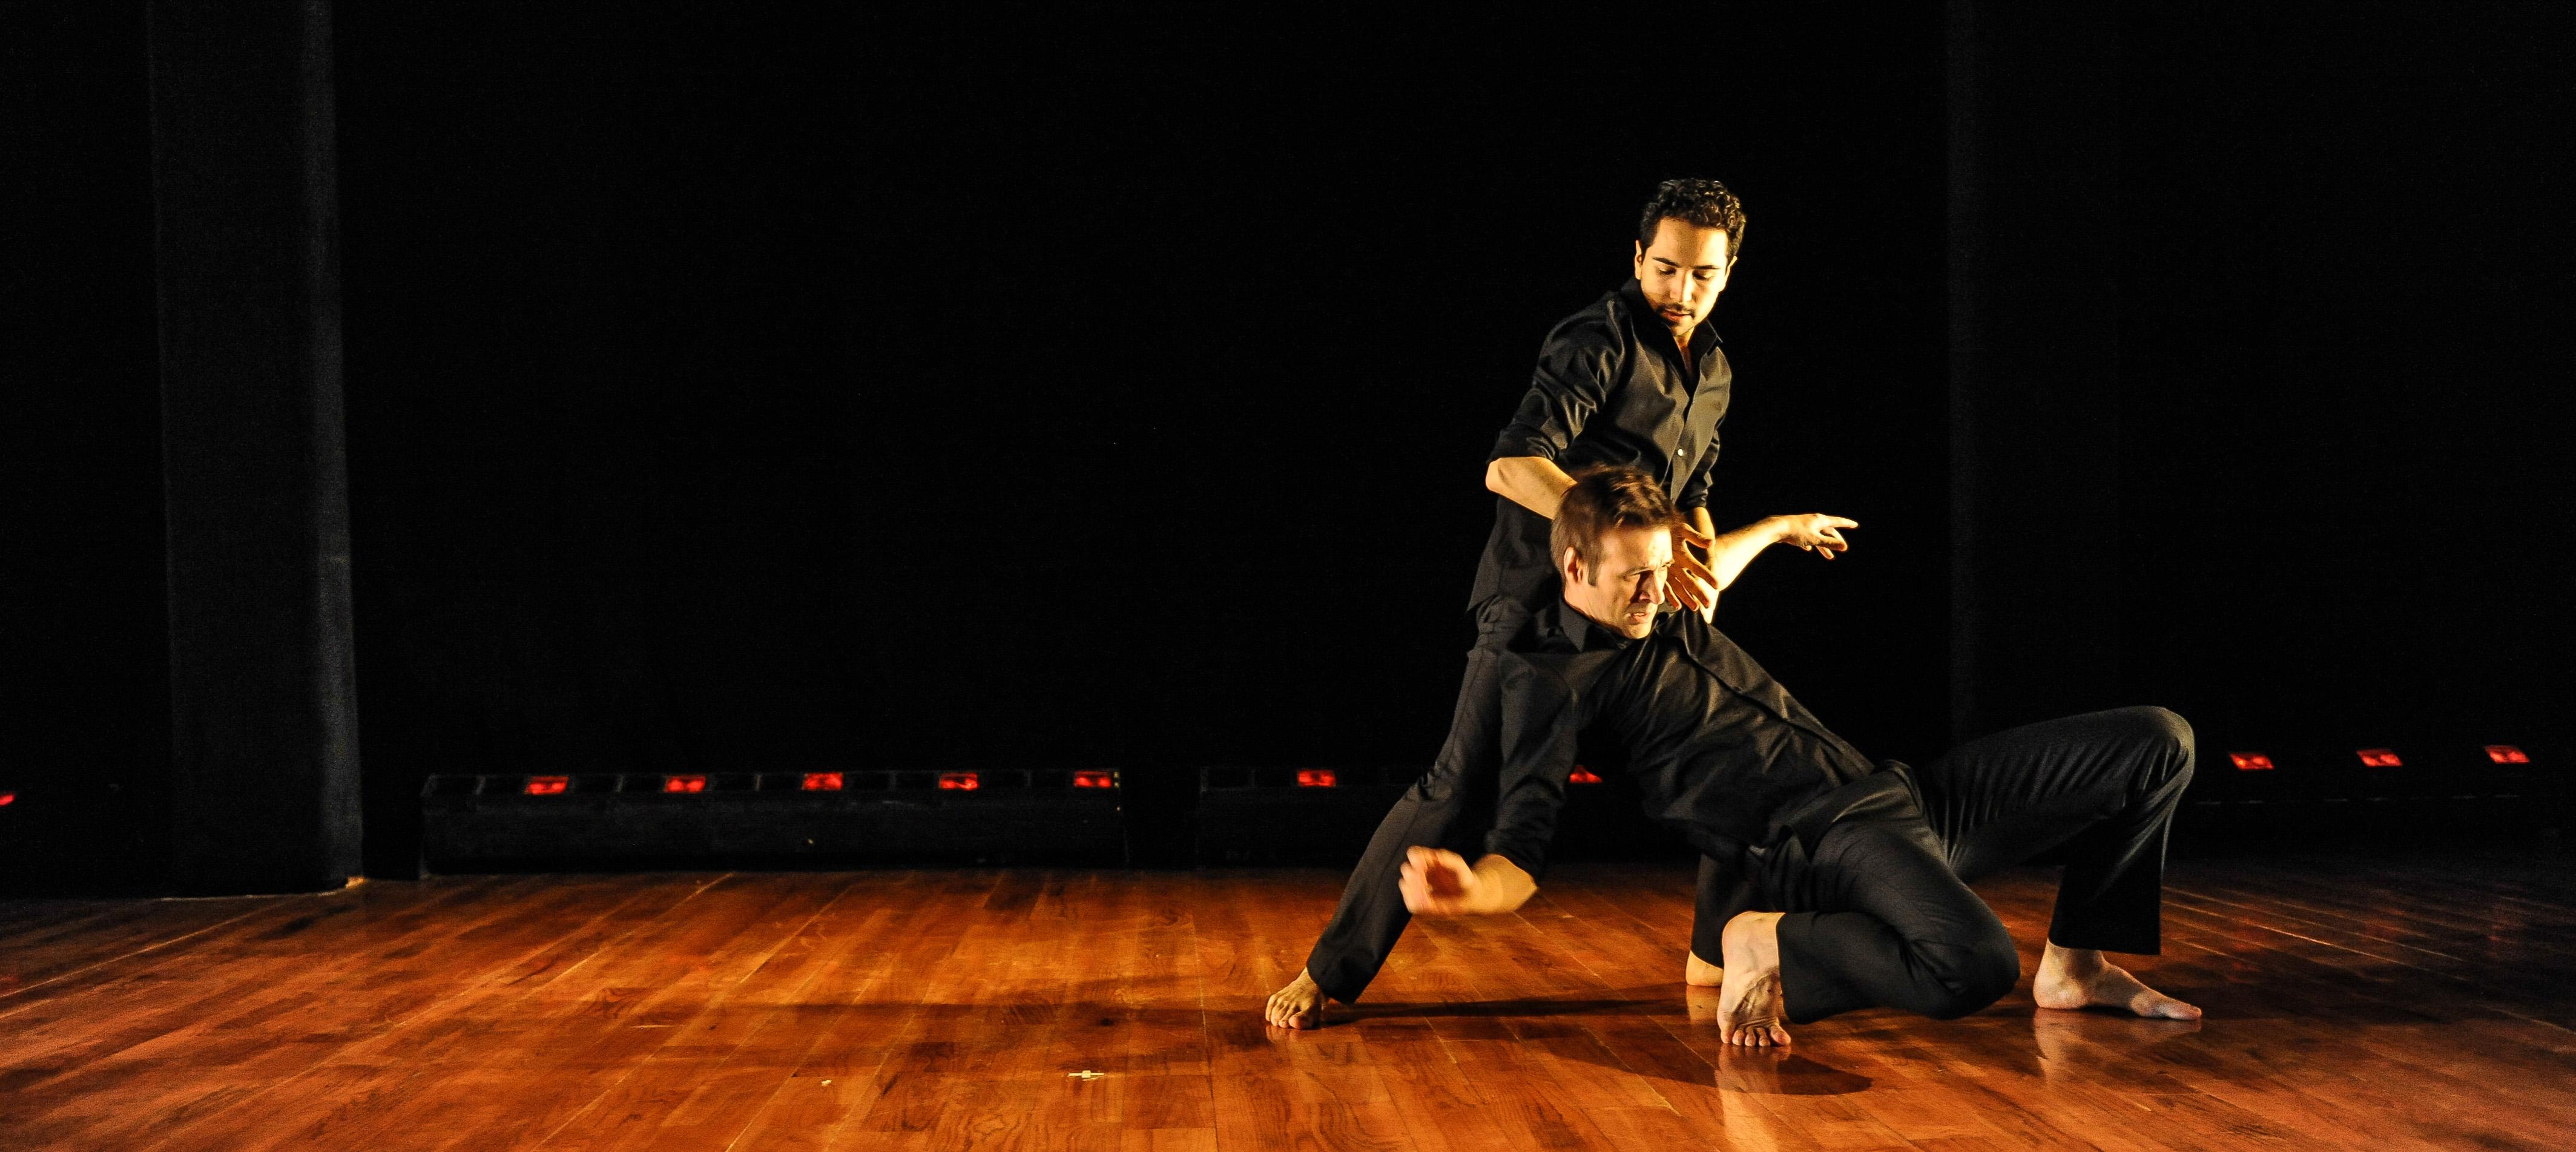 Pascal Rekoert/ Flexicurve - Choreography